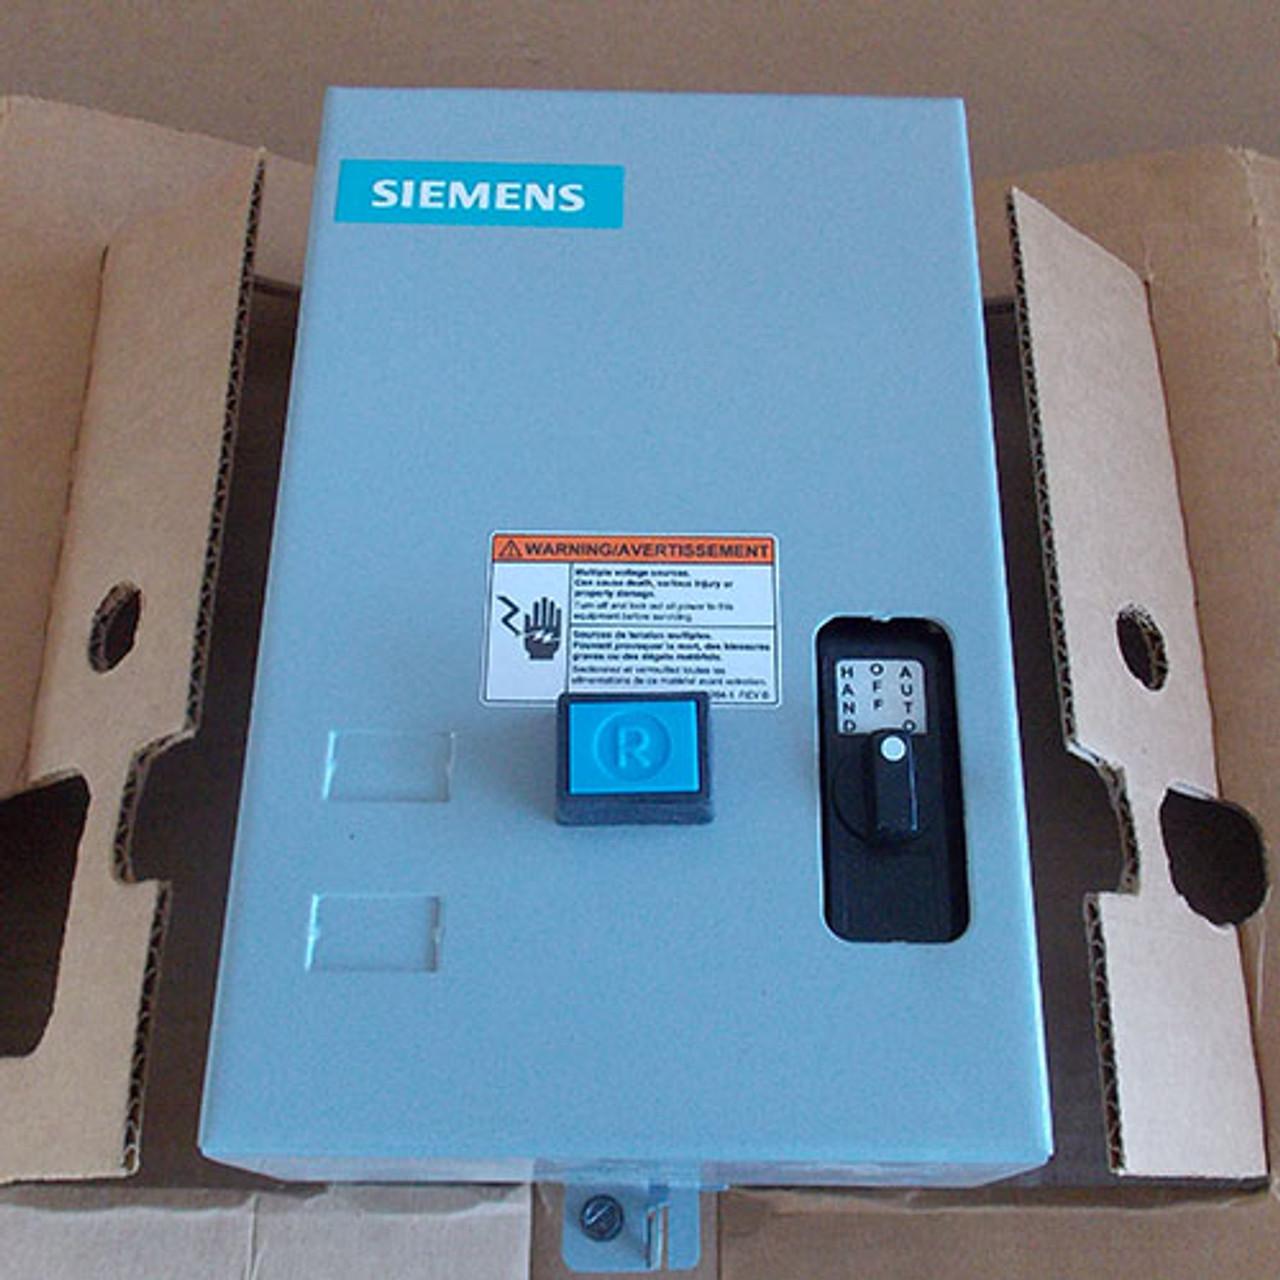 Siemens 14CSB32BF Size 0 Magnetic Starter 3 PH 18A 120V NEMA 1 - New